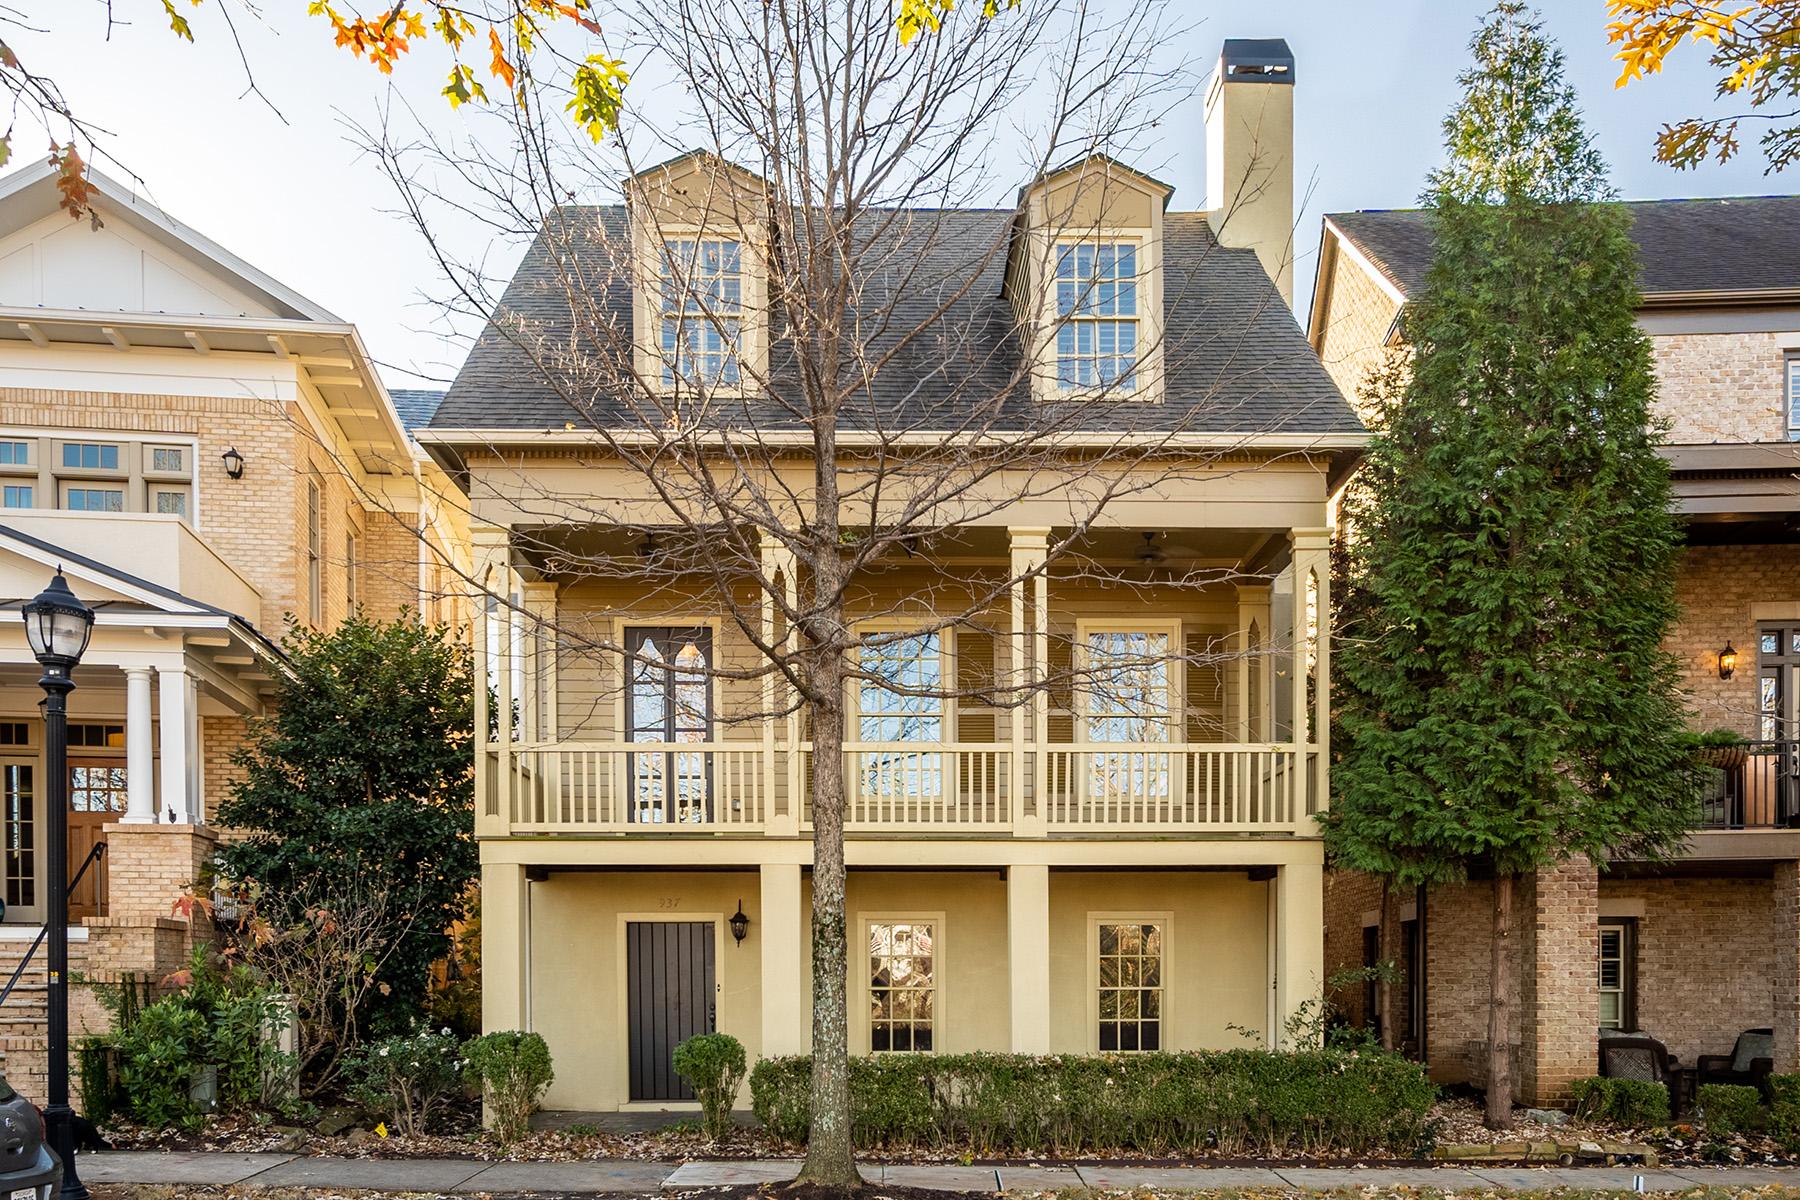 Single Family Home for Rent at Glenwood Park Craftsman Overlooking Park 937 Faith Avenue Atlanta, Georgia 30316 United States